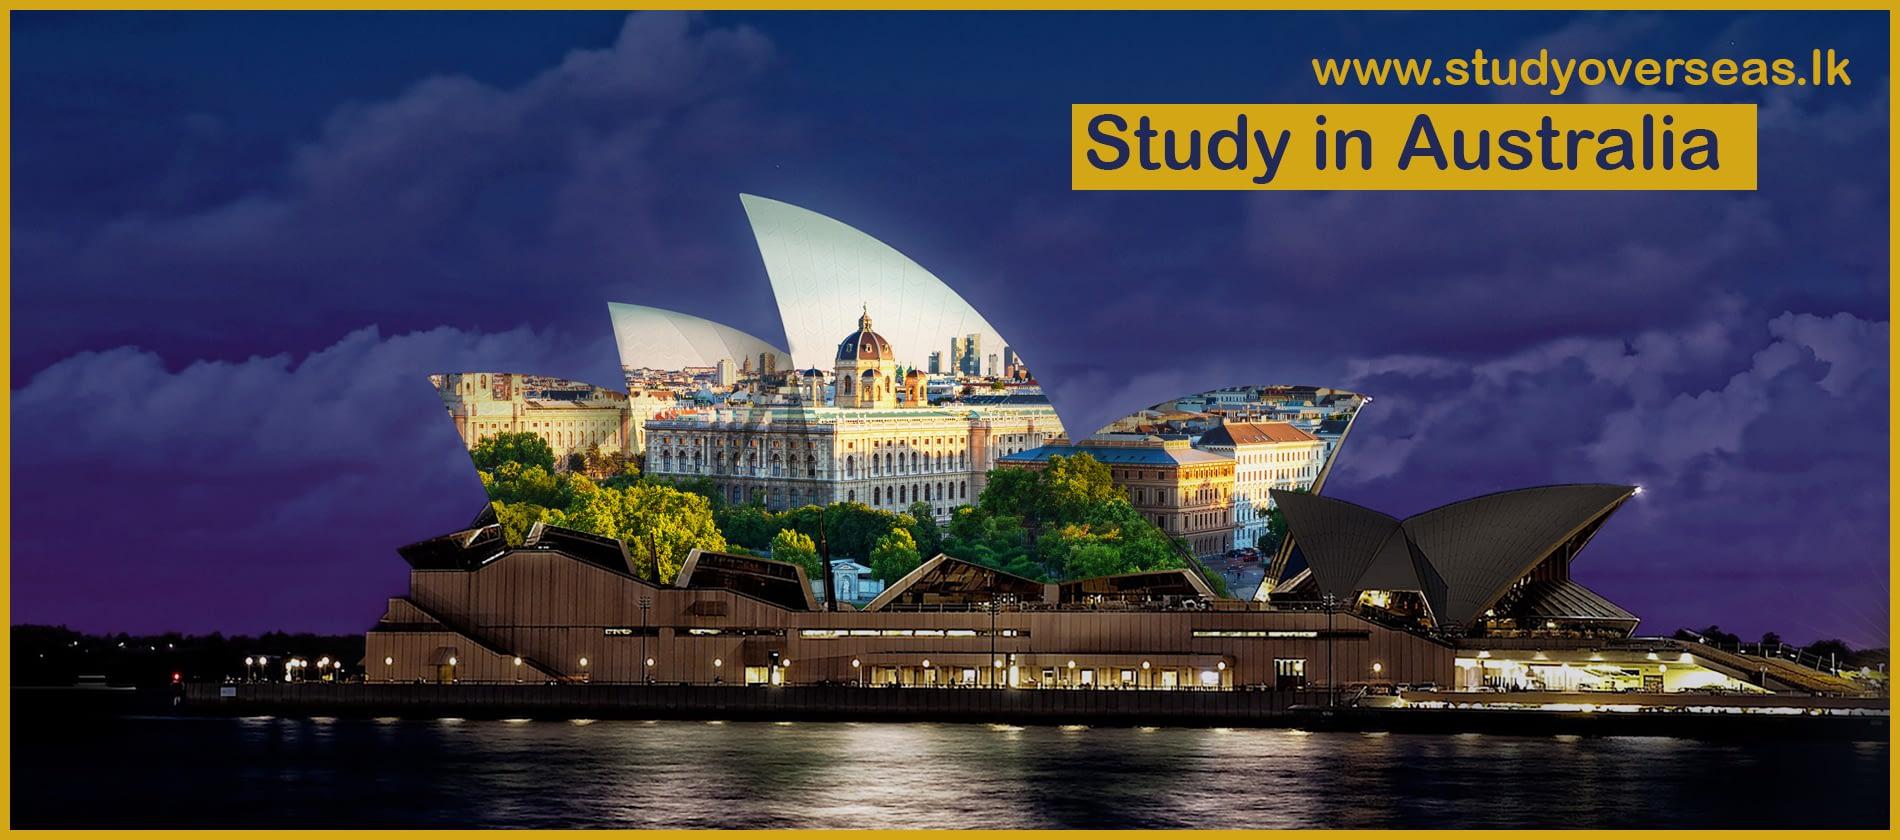 study_in_australia_sydney_www.studyoverseas.lk